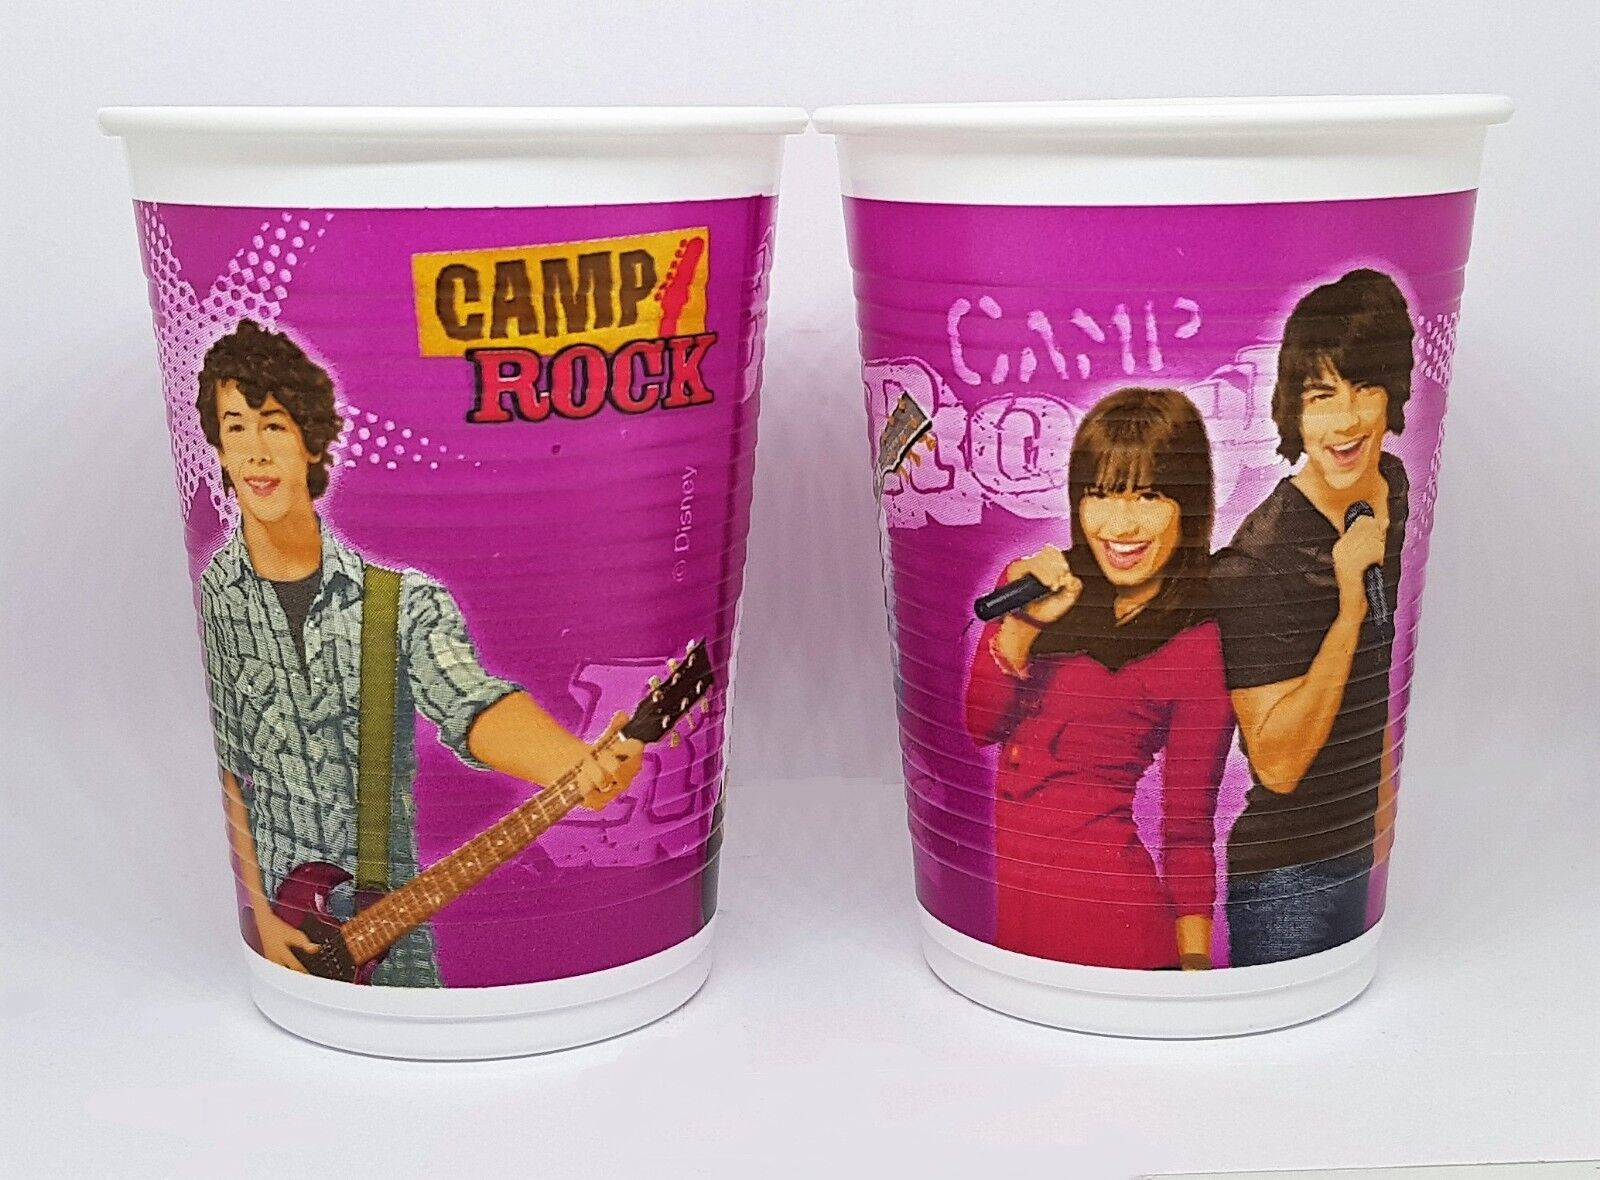 JOBLOT 240x Plastic Cups 200ml Disney's Camp Rock Party Cups